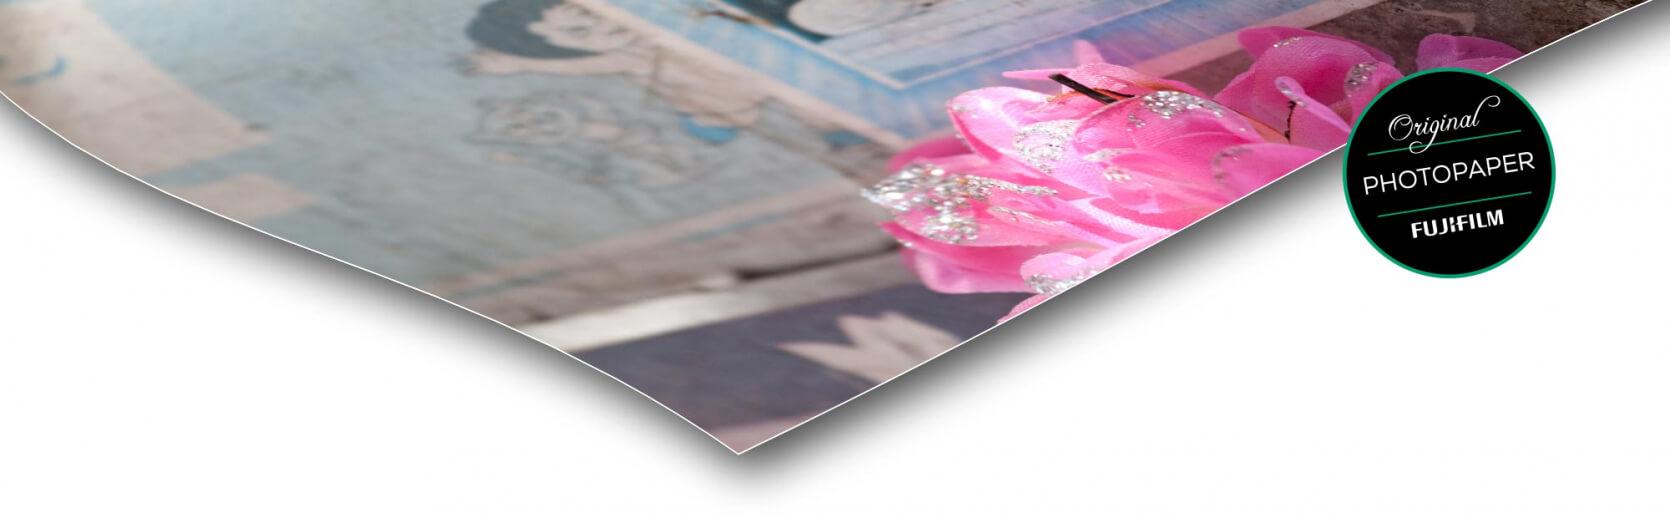 fotopapier foto op hout block mat